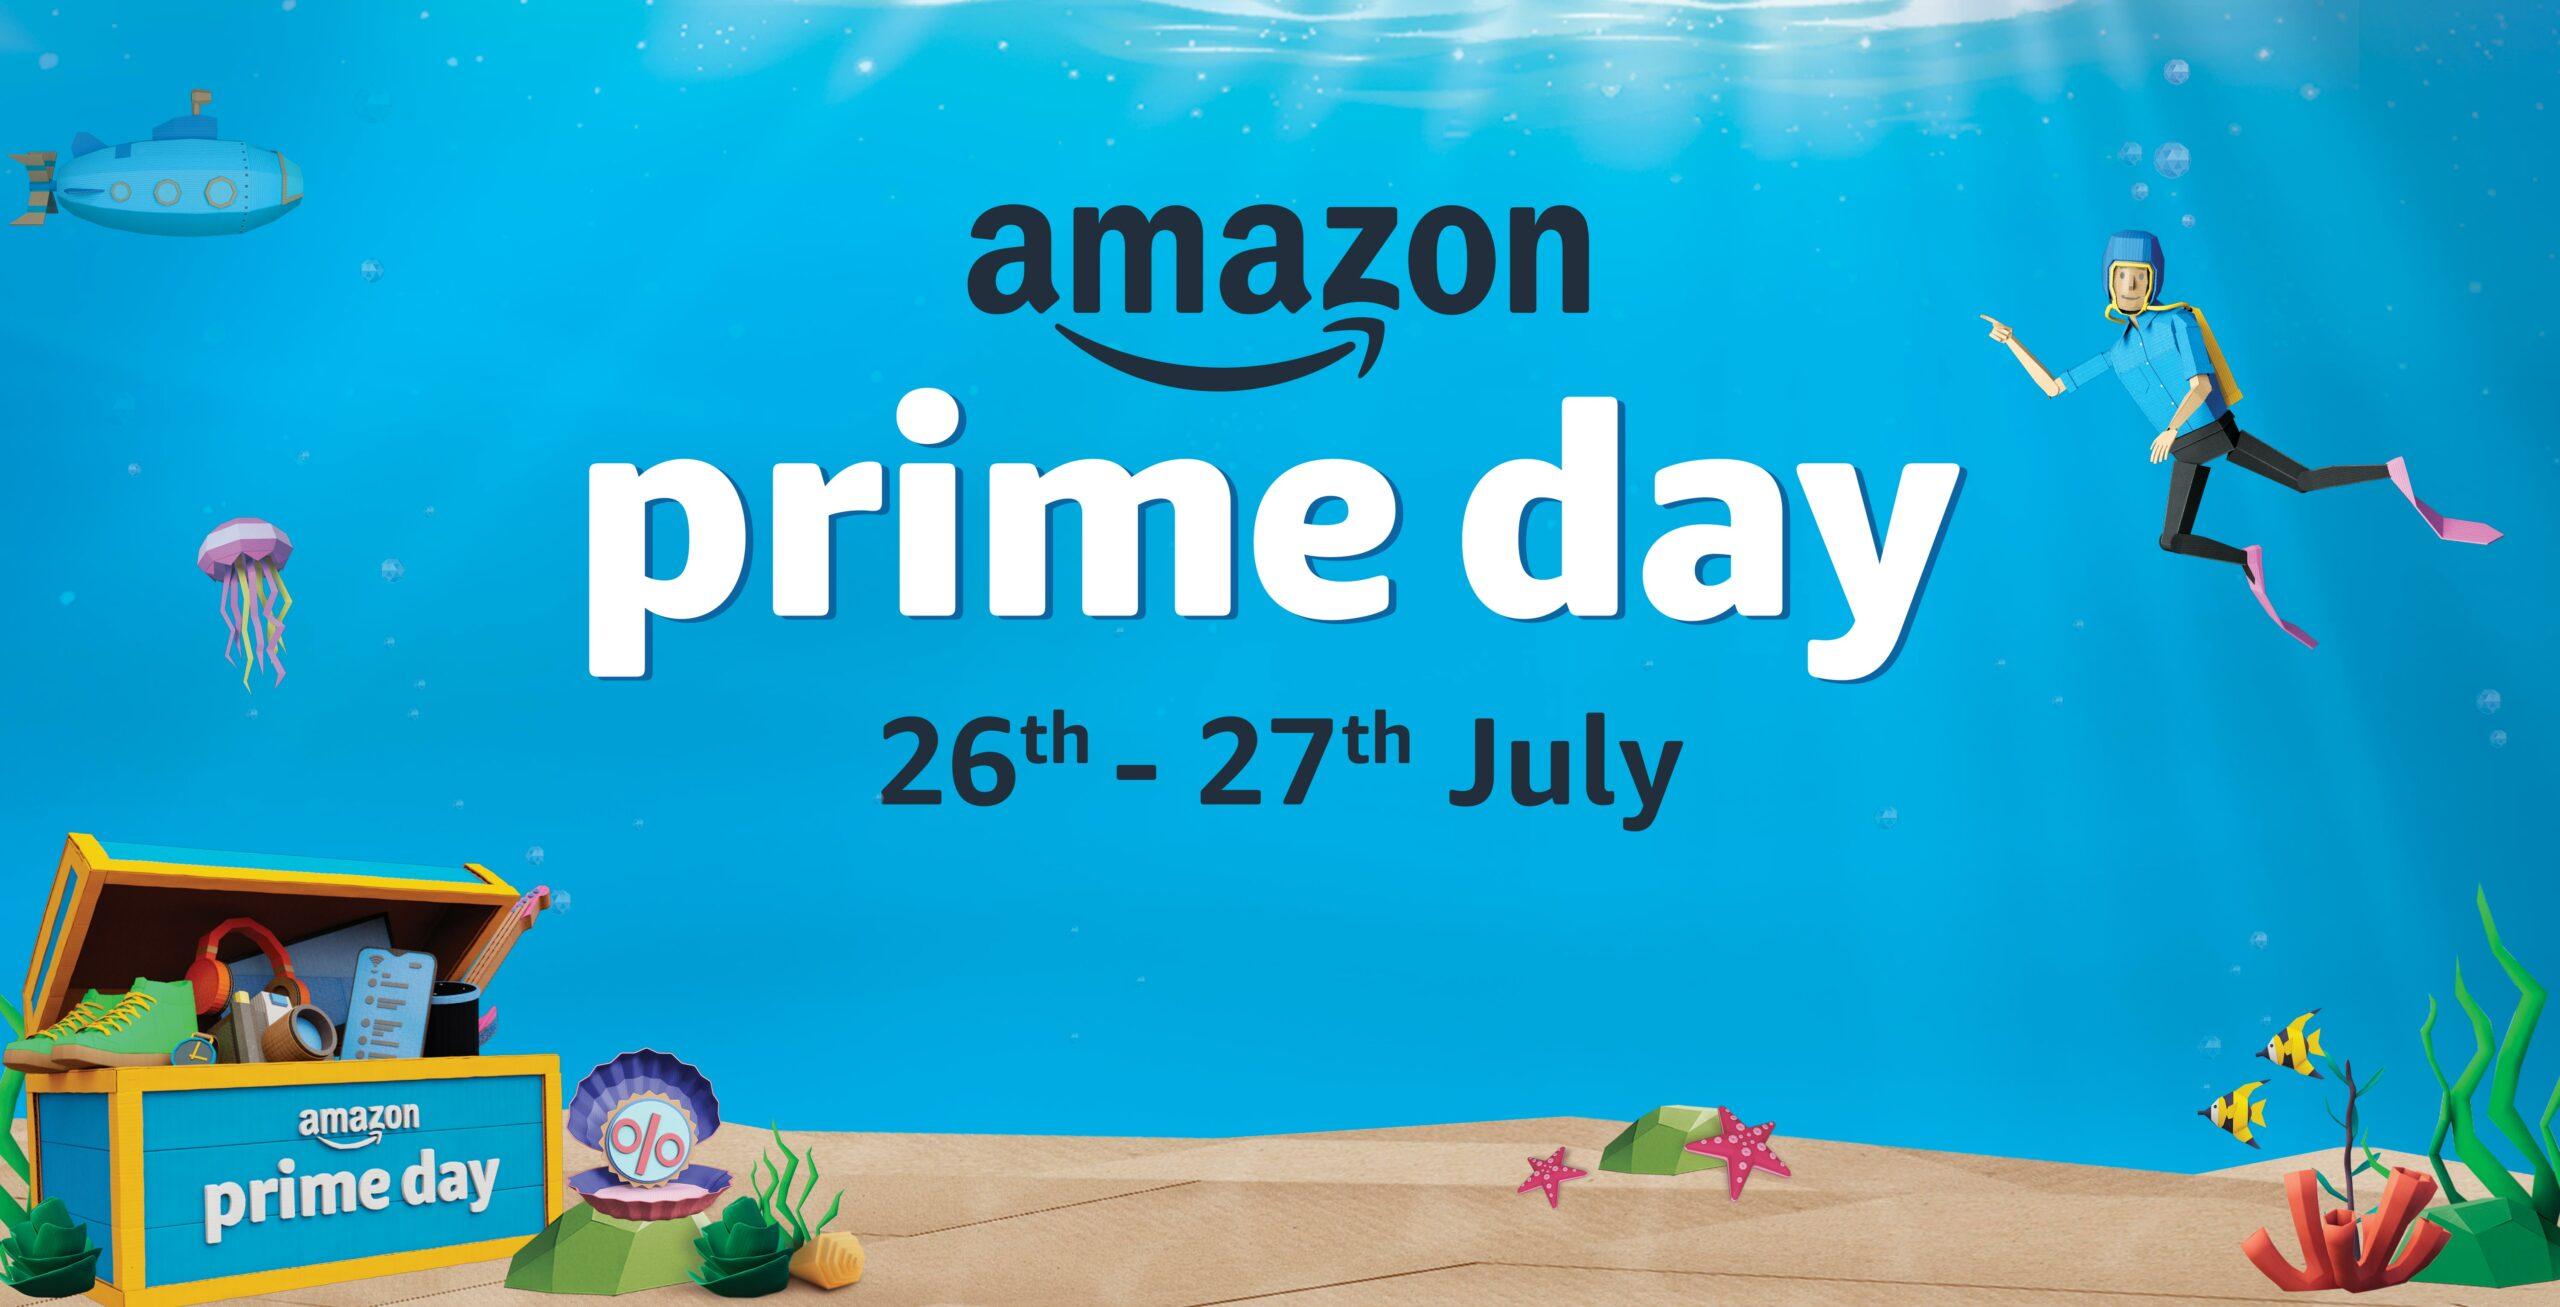 Amazon announces Prime Day Sale